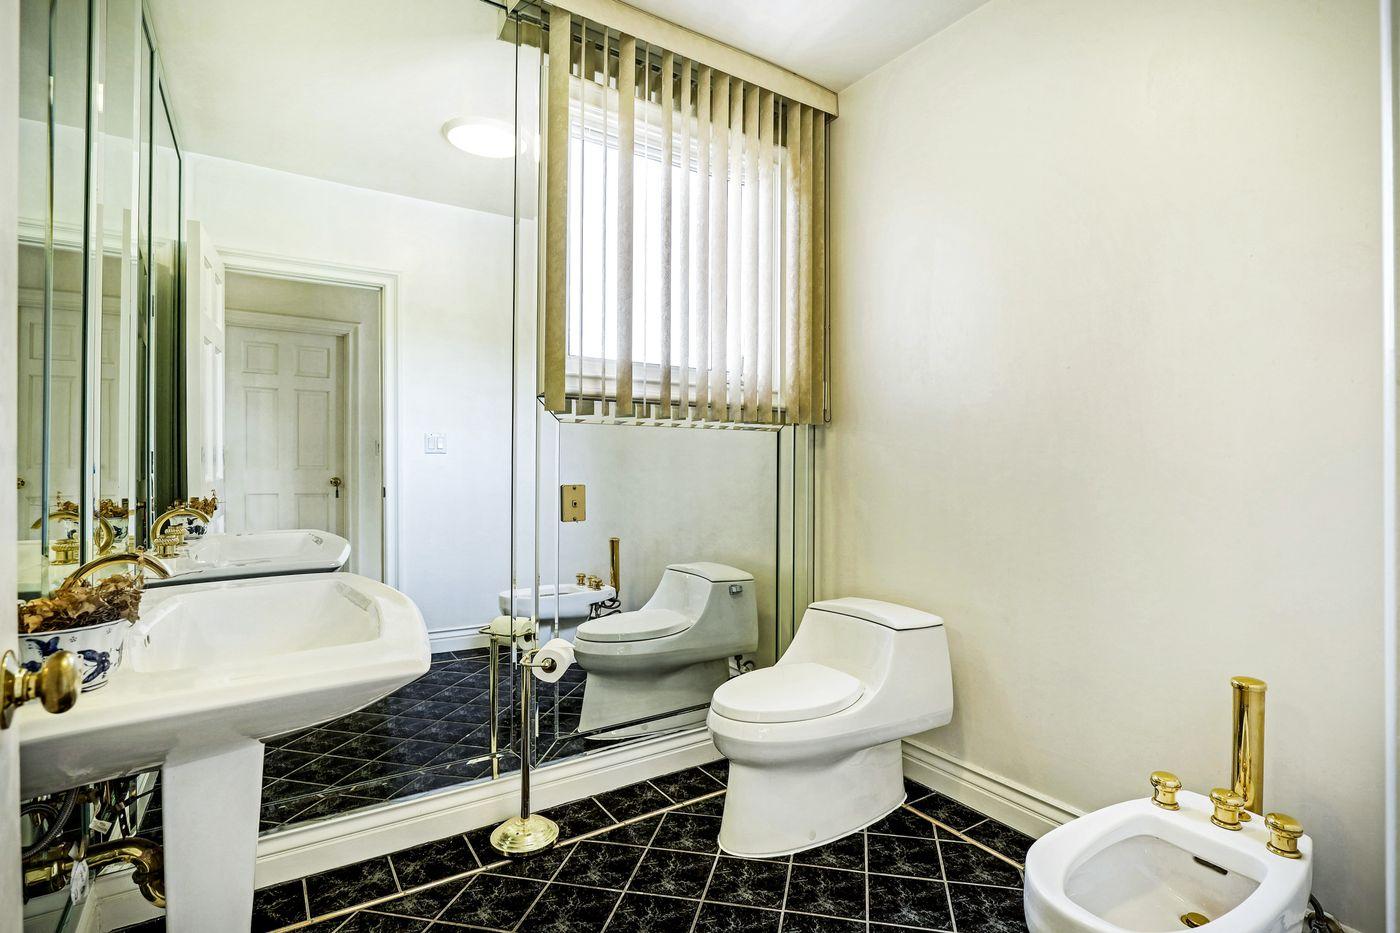 real-estate-photography-2245 Kingsbridge Ct-San Dimas-91773-airbnb-rental-interior-design-photographer-kasi-hyrapett-32